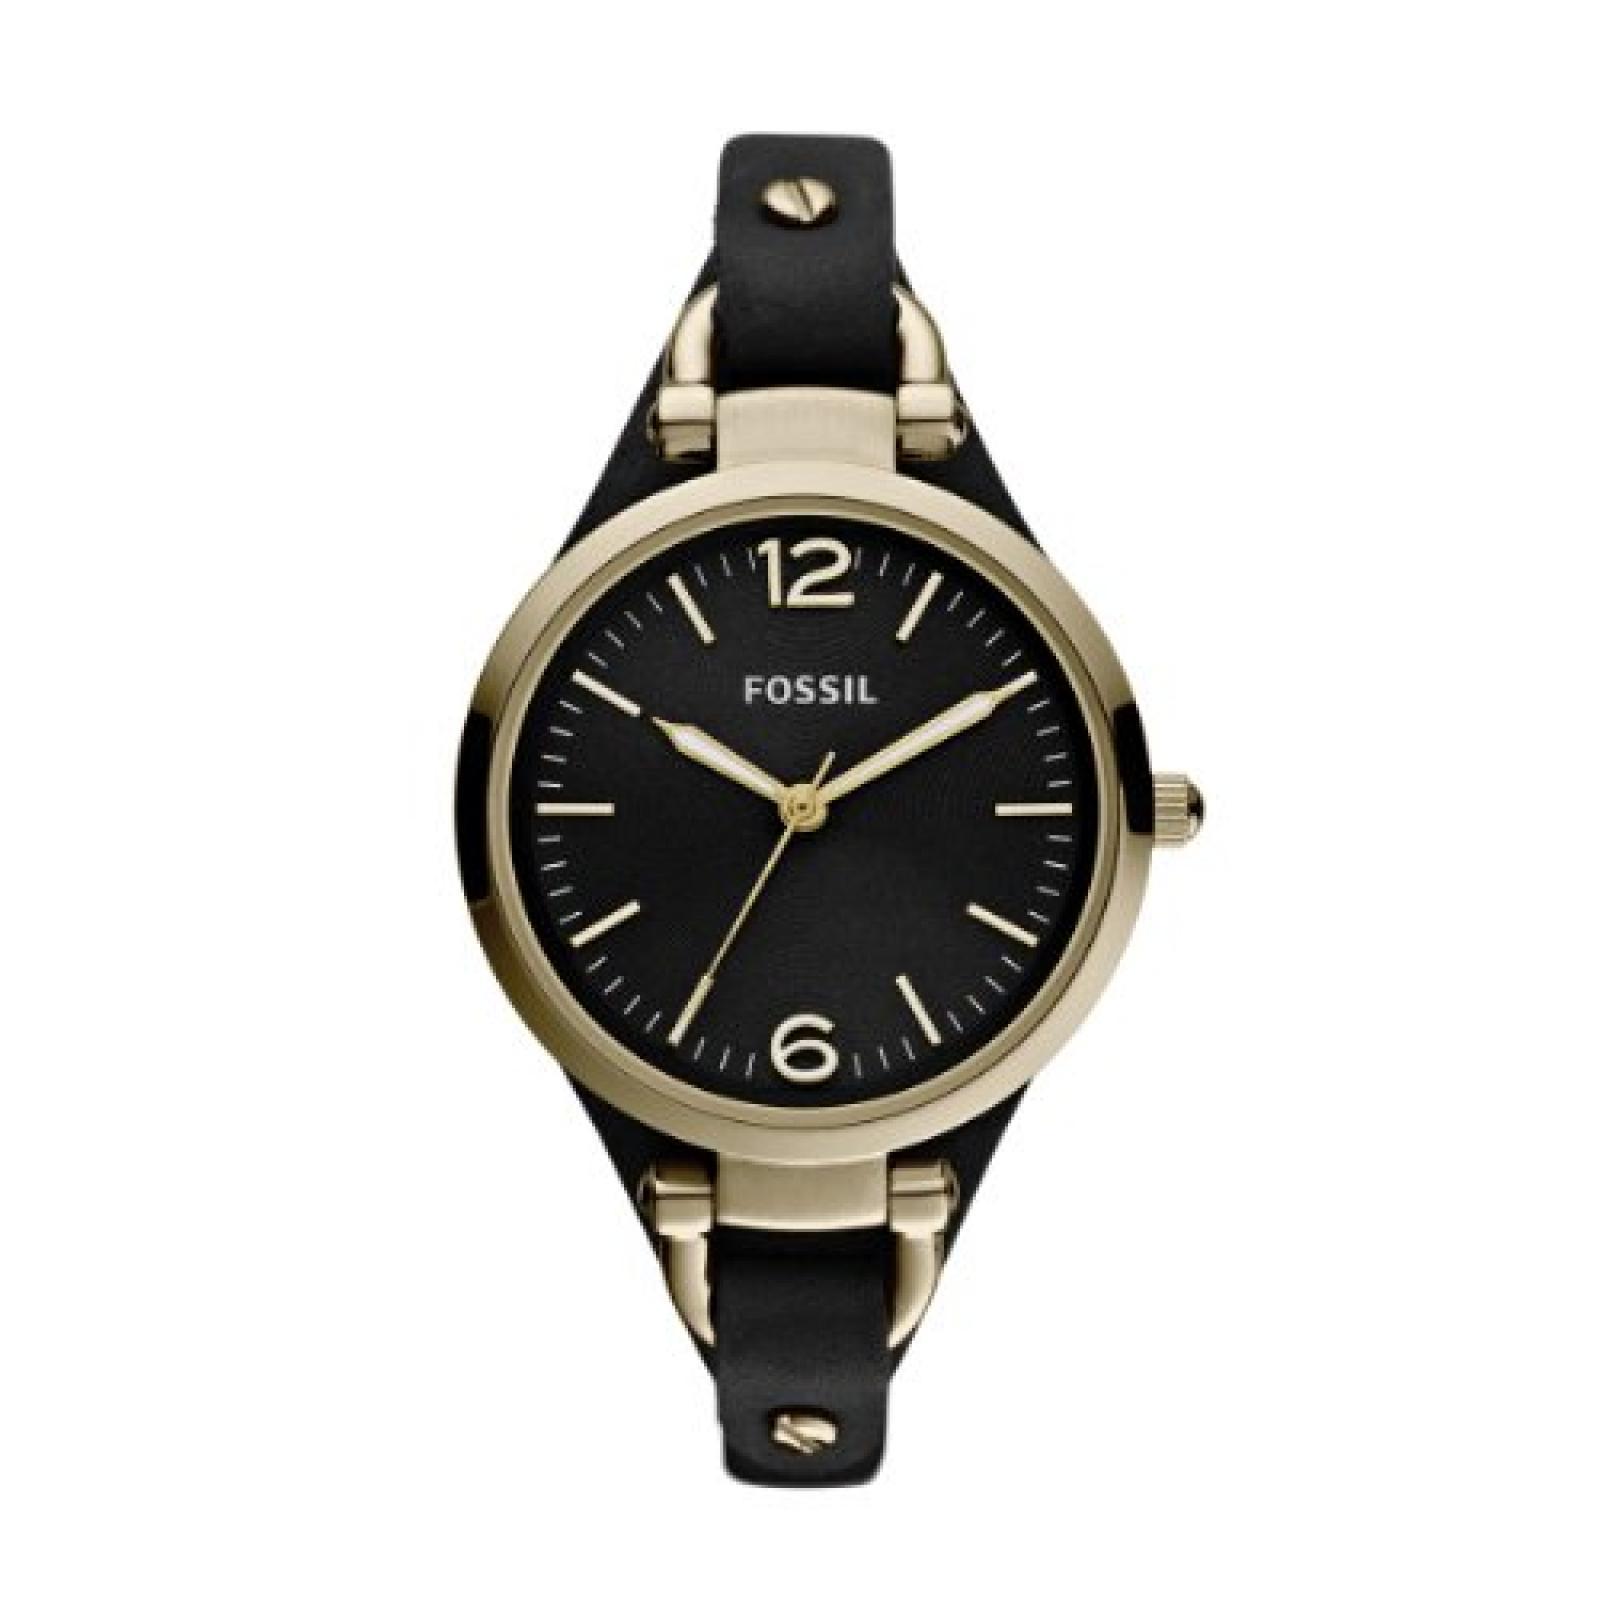 Fossil Damen-Armbanduhr XS Analog Quarz Leder ES3148